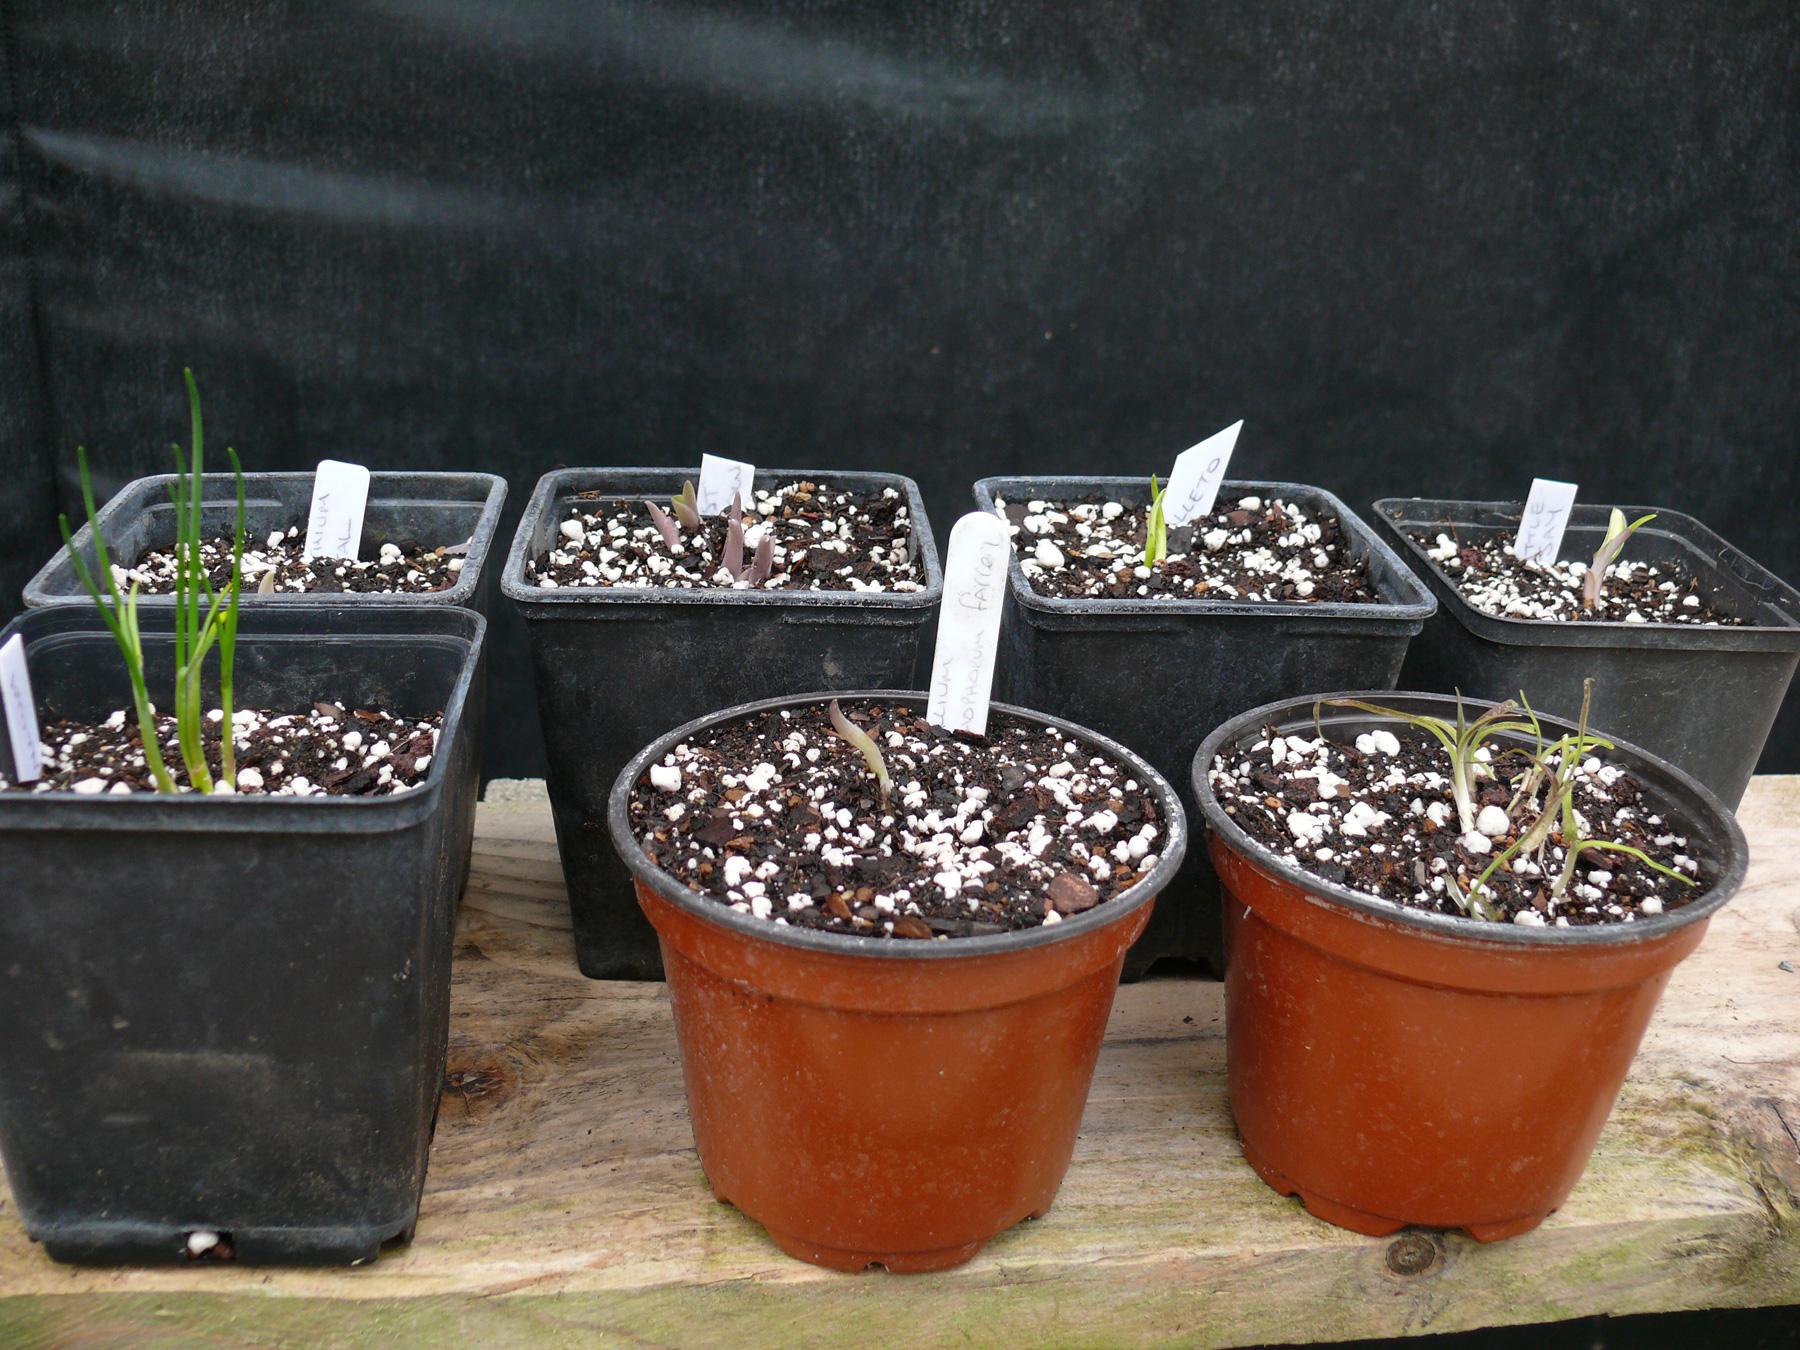 new plants arrived for kusamono